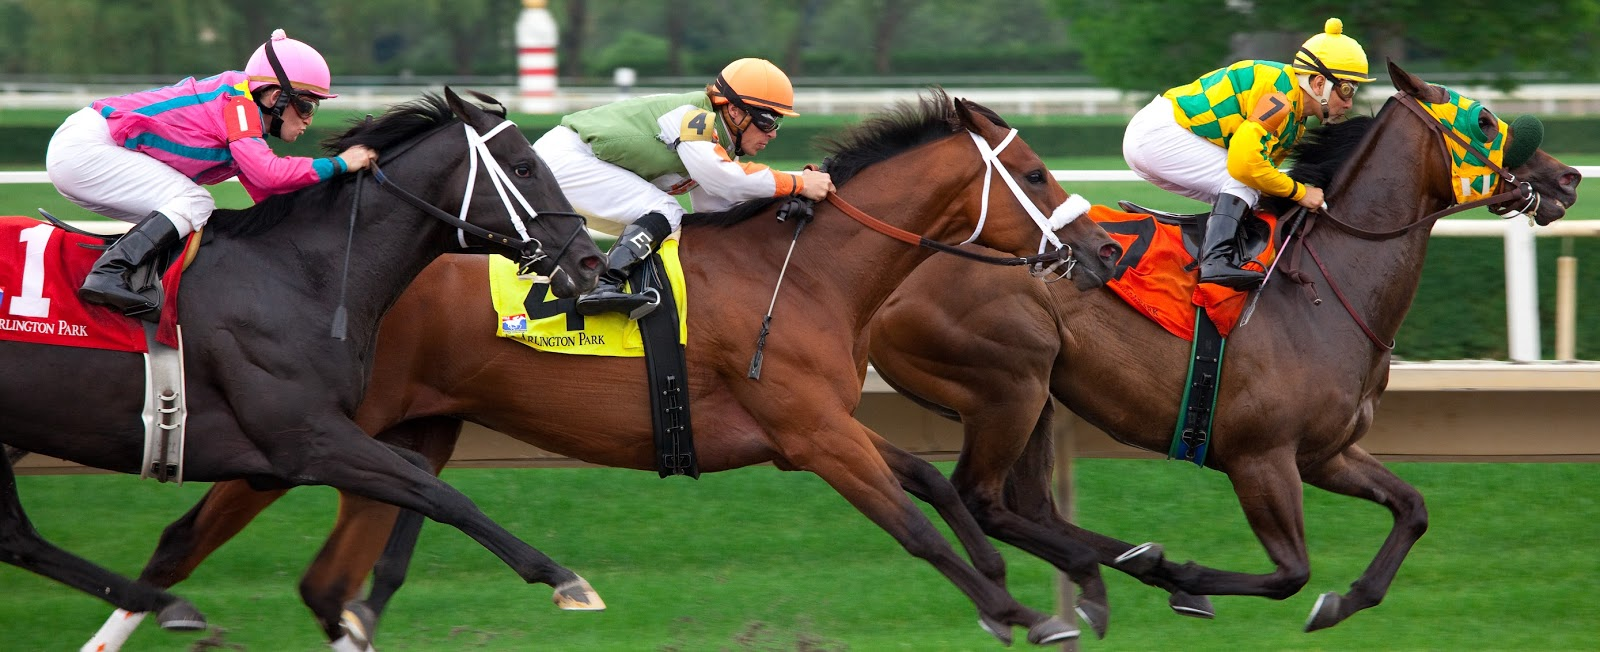 Horse Racing in Australia - Horse Racing Today: Top Qualities Of a